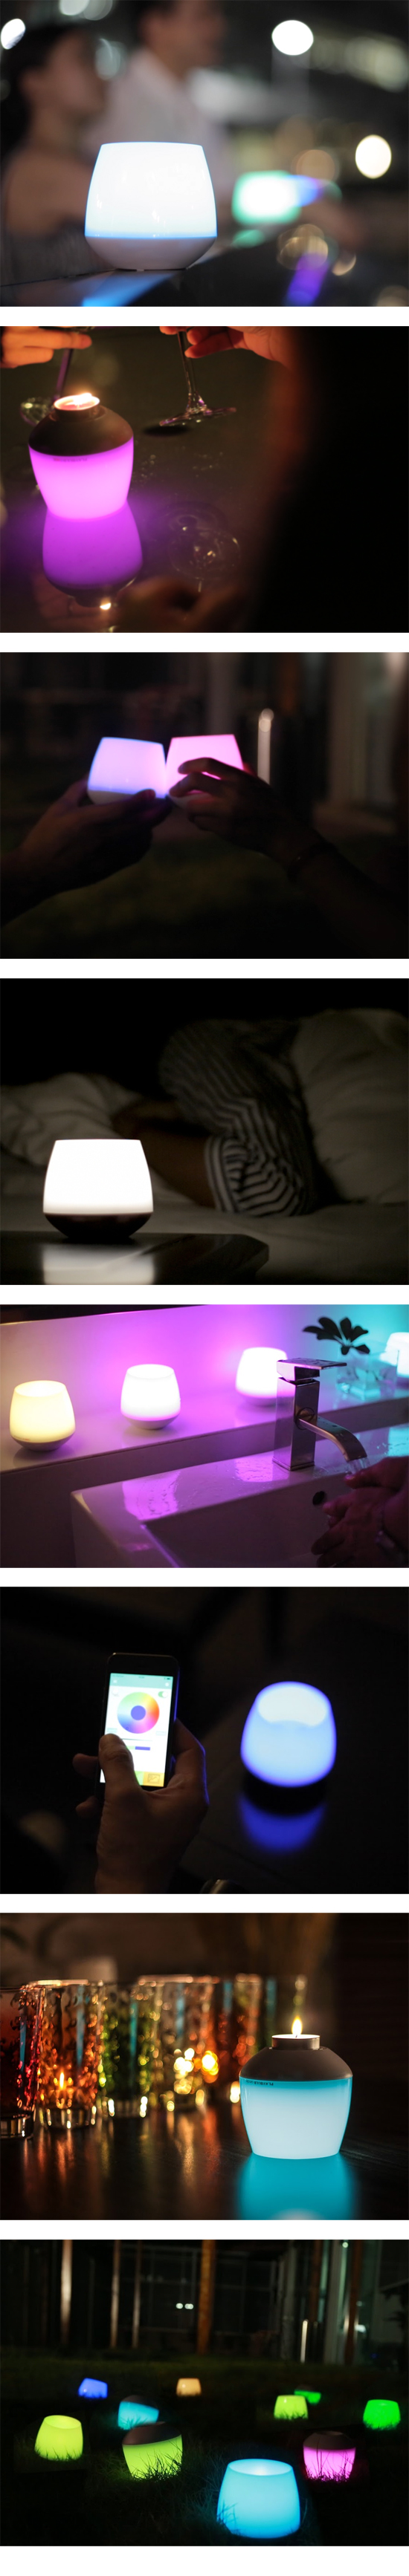 MiPow PLAYBULB 魔泡 CANDLE 智慧LED蠟燭燈